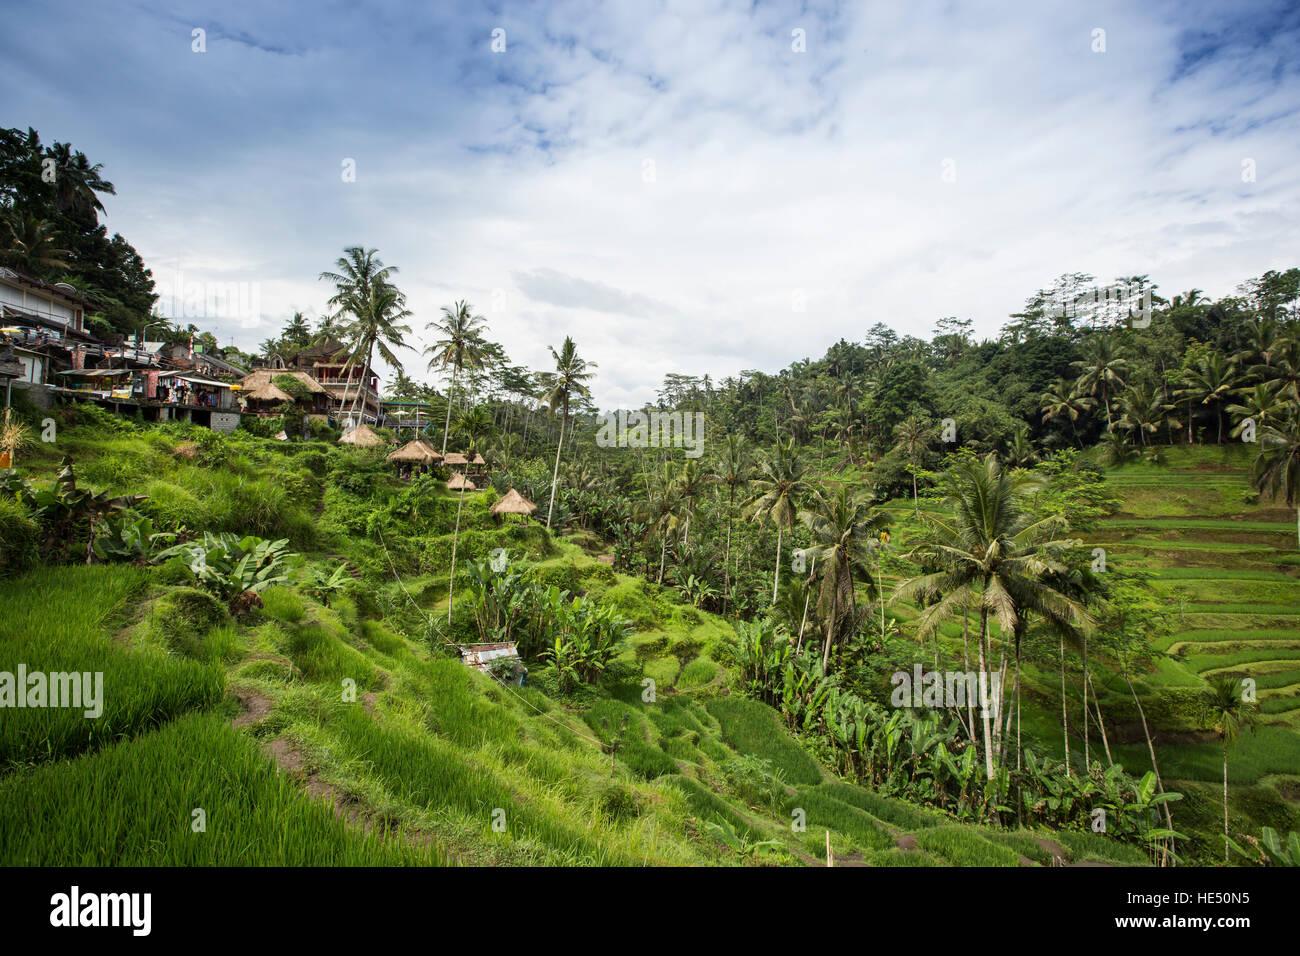 rice terraces in Tegallalang, Ubud, Bali - Stock Image